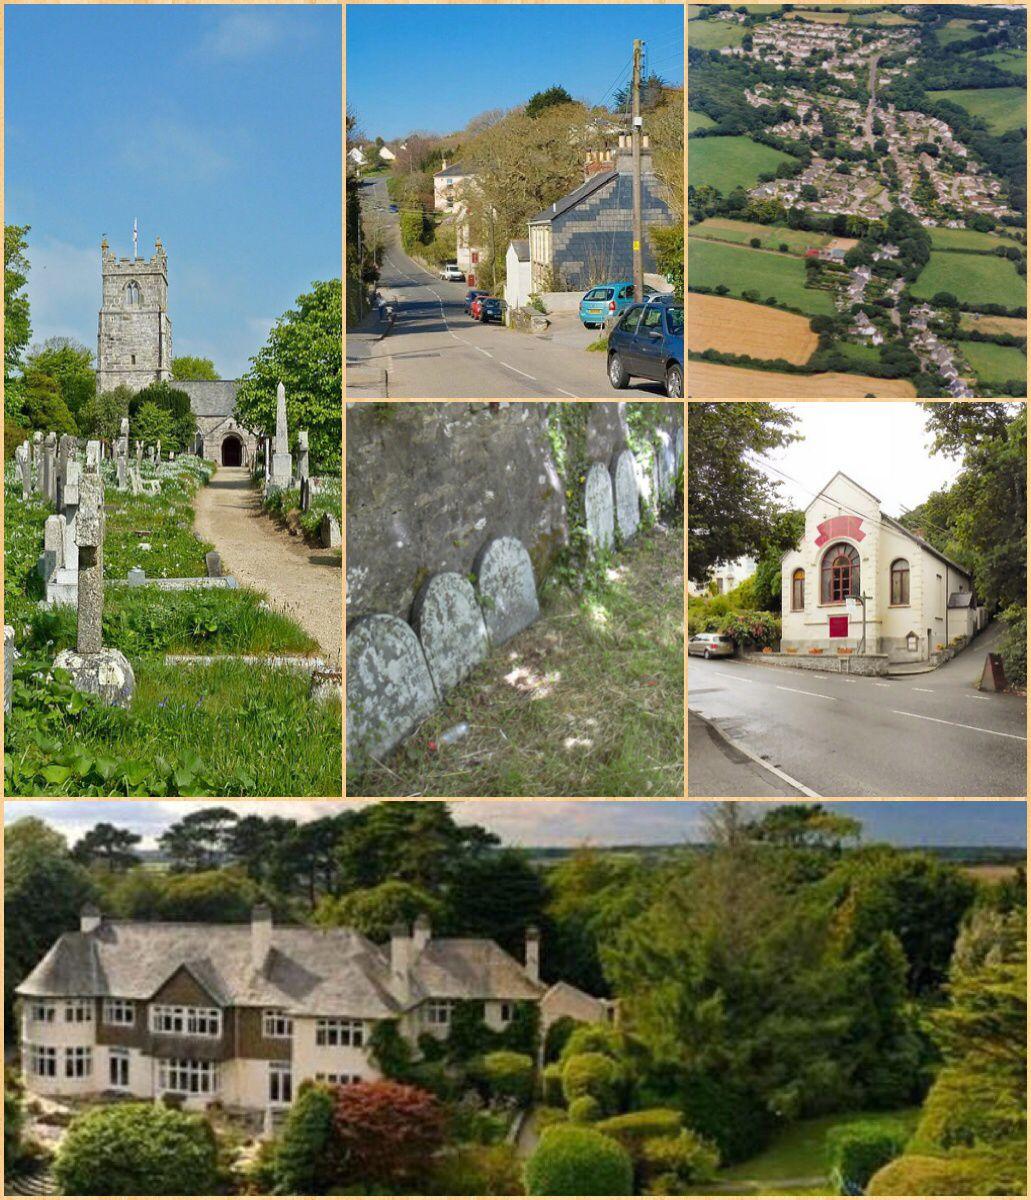 Budock or Budock Water (Cornish Dowr Budhek) is a civil